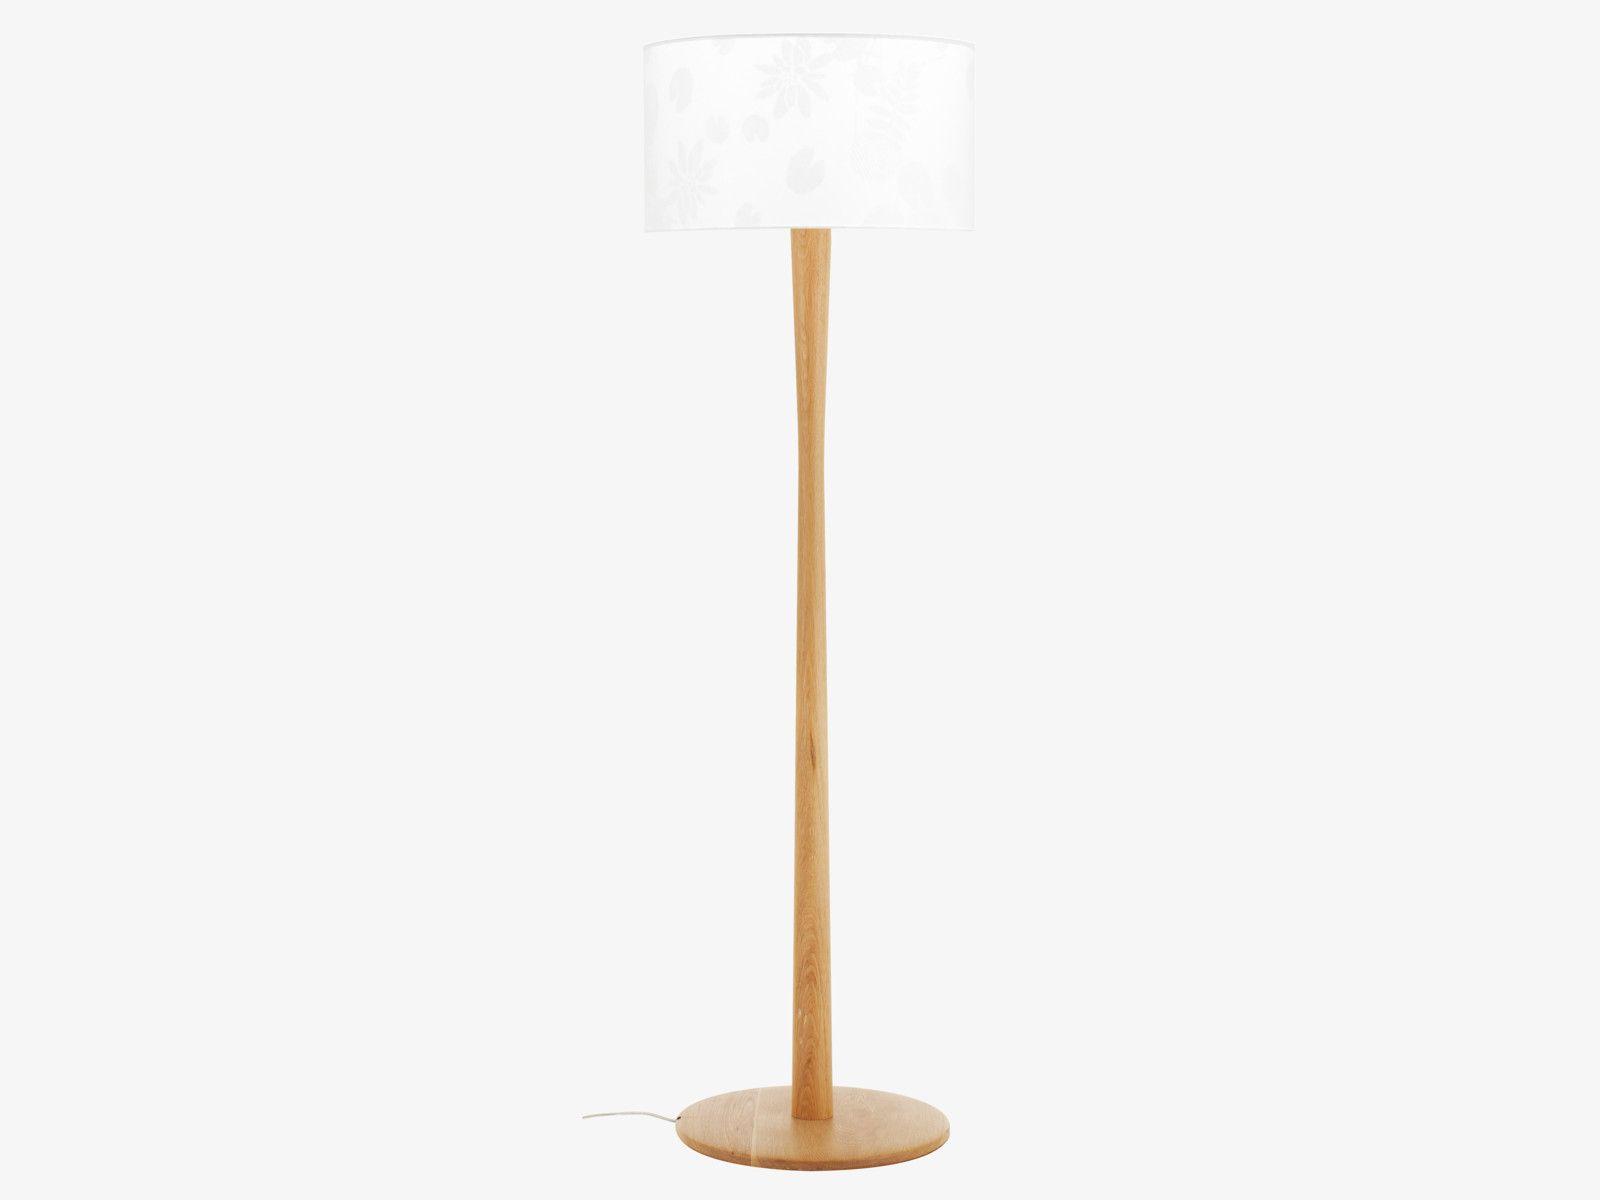 Pole natural oak oak floor lamp base habitatuk lighting pole natural oak oak floor lamp base habitatuk mozeypictures Gallery